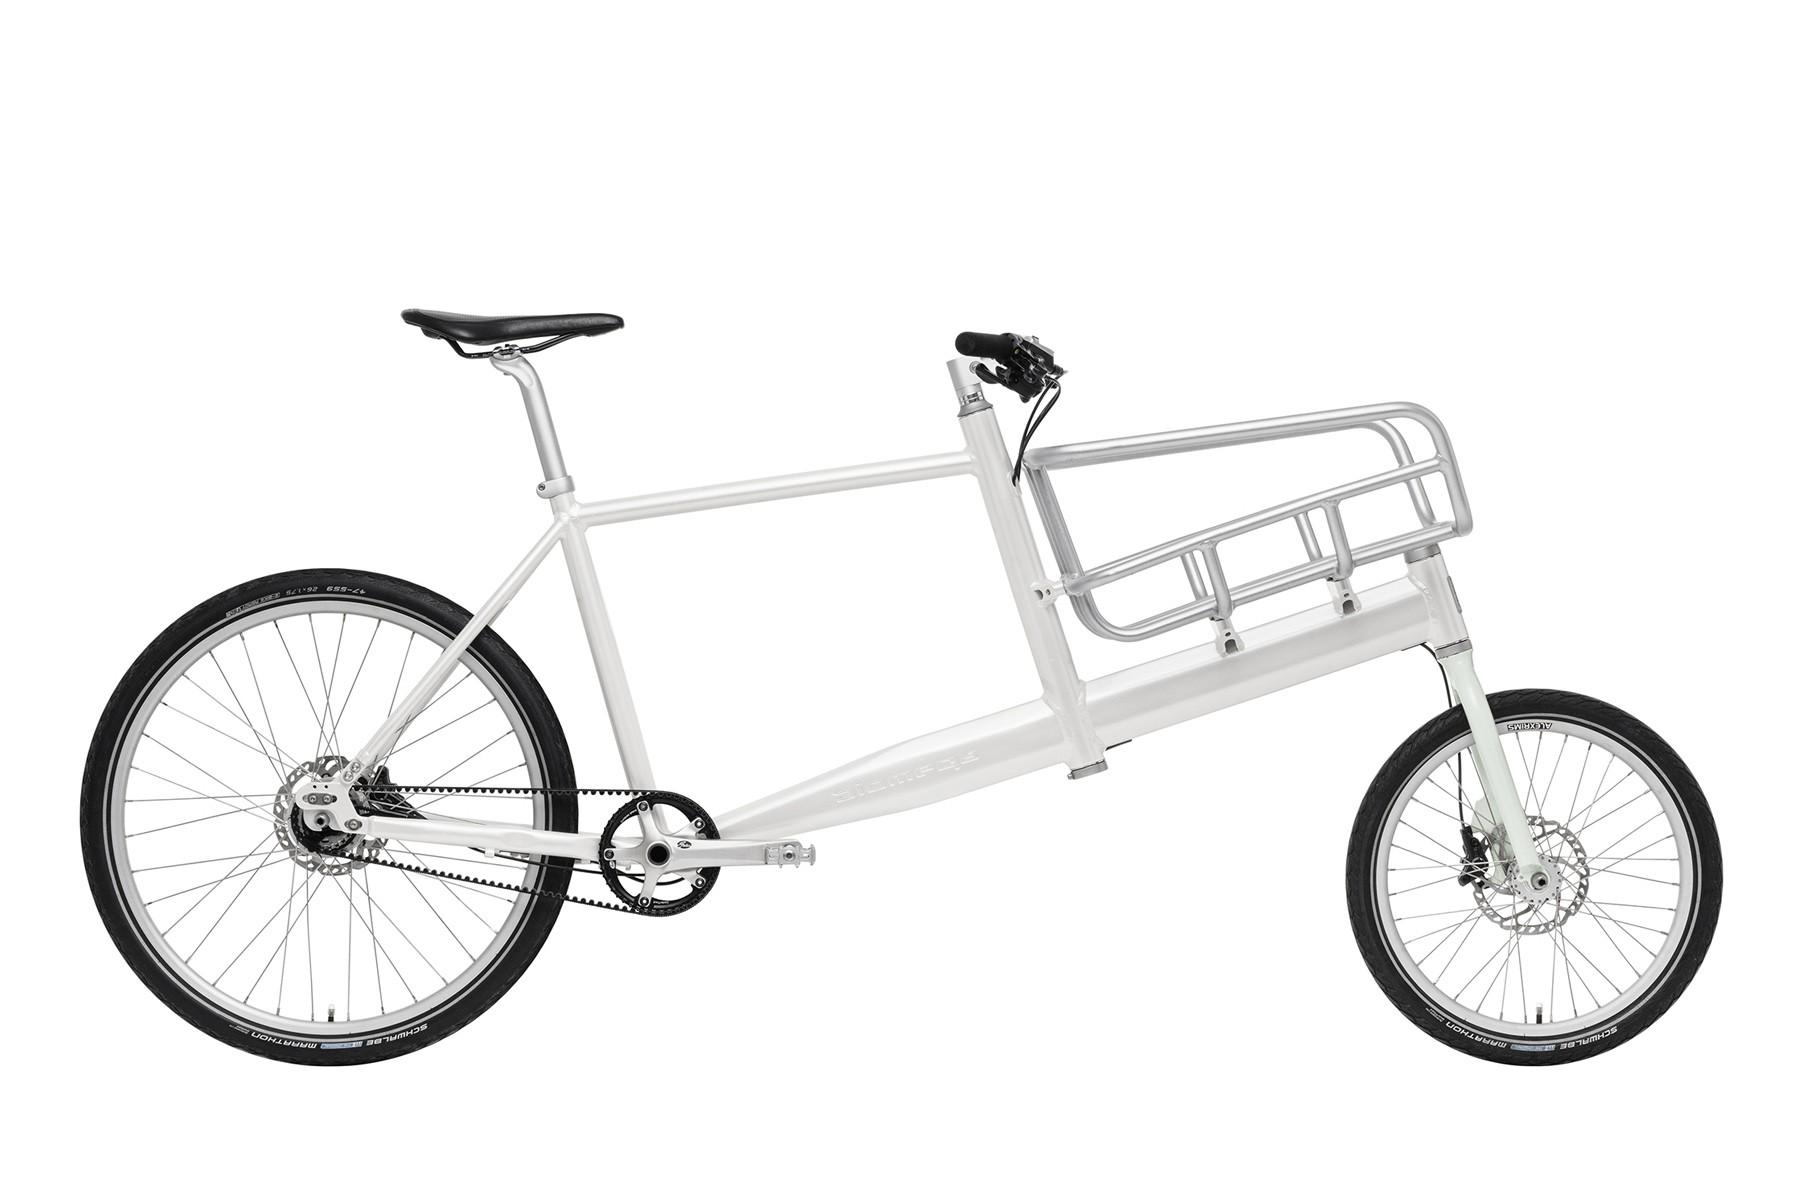 PEK Biomega Beijing Cykel